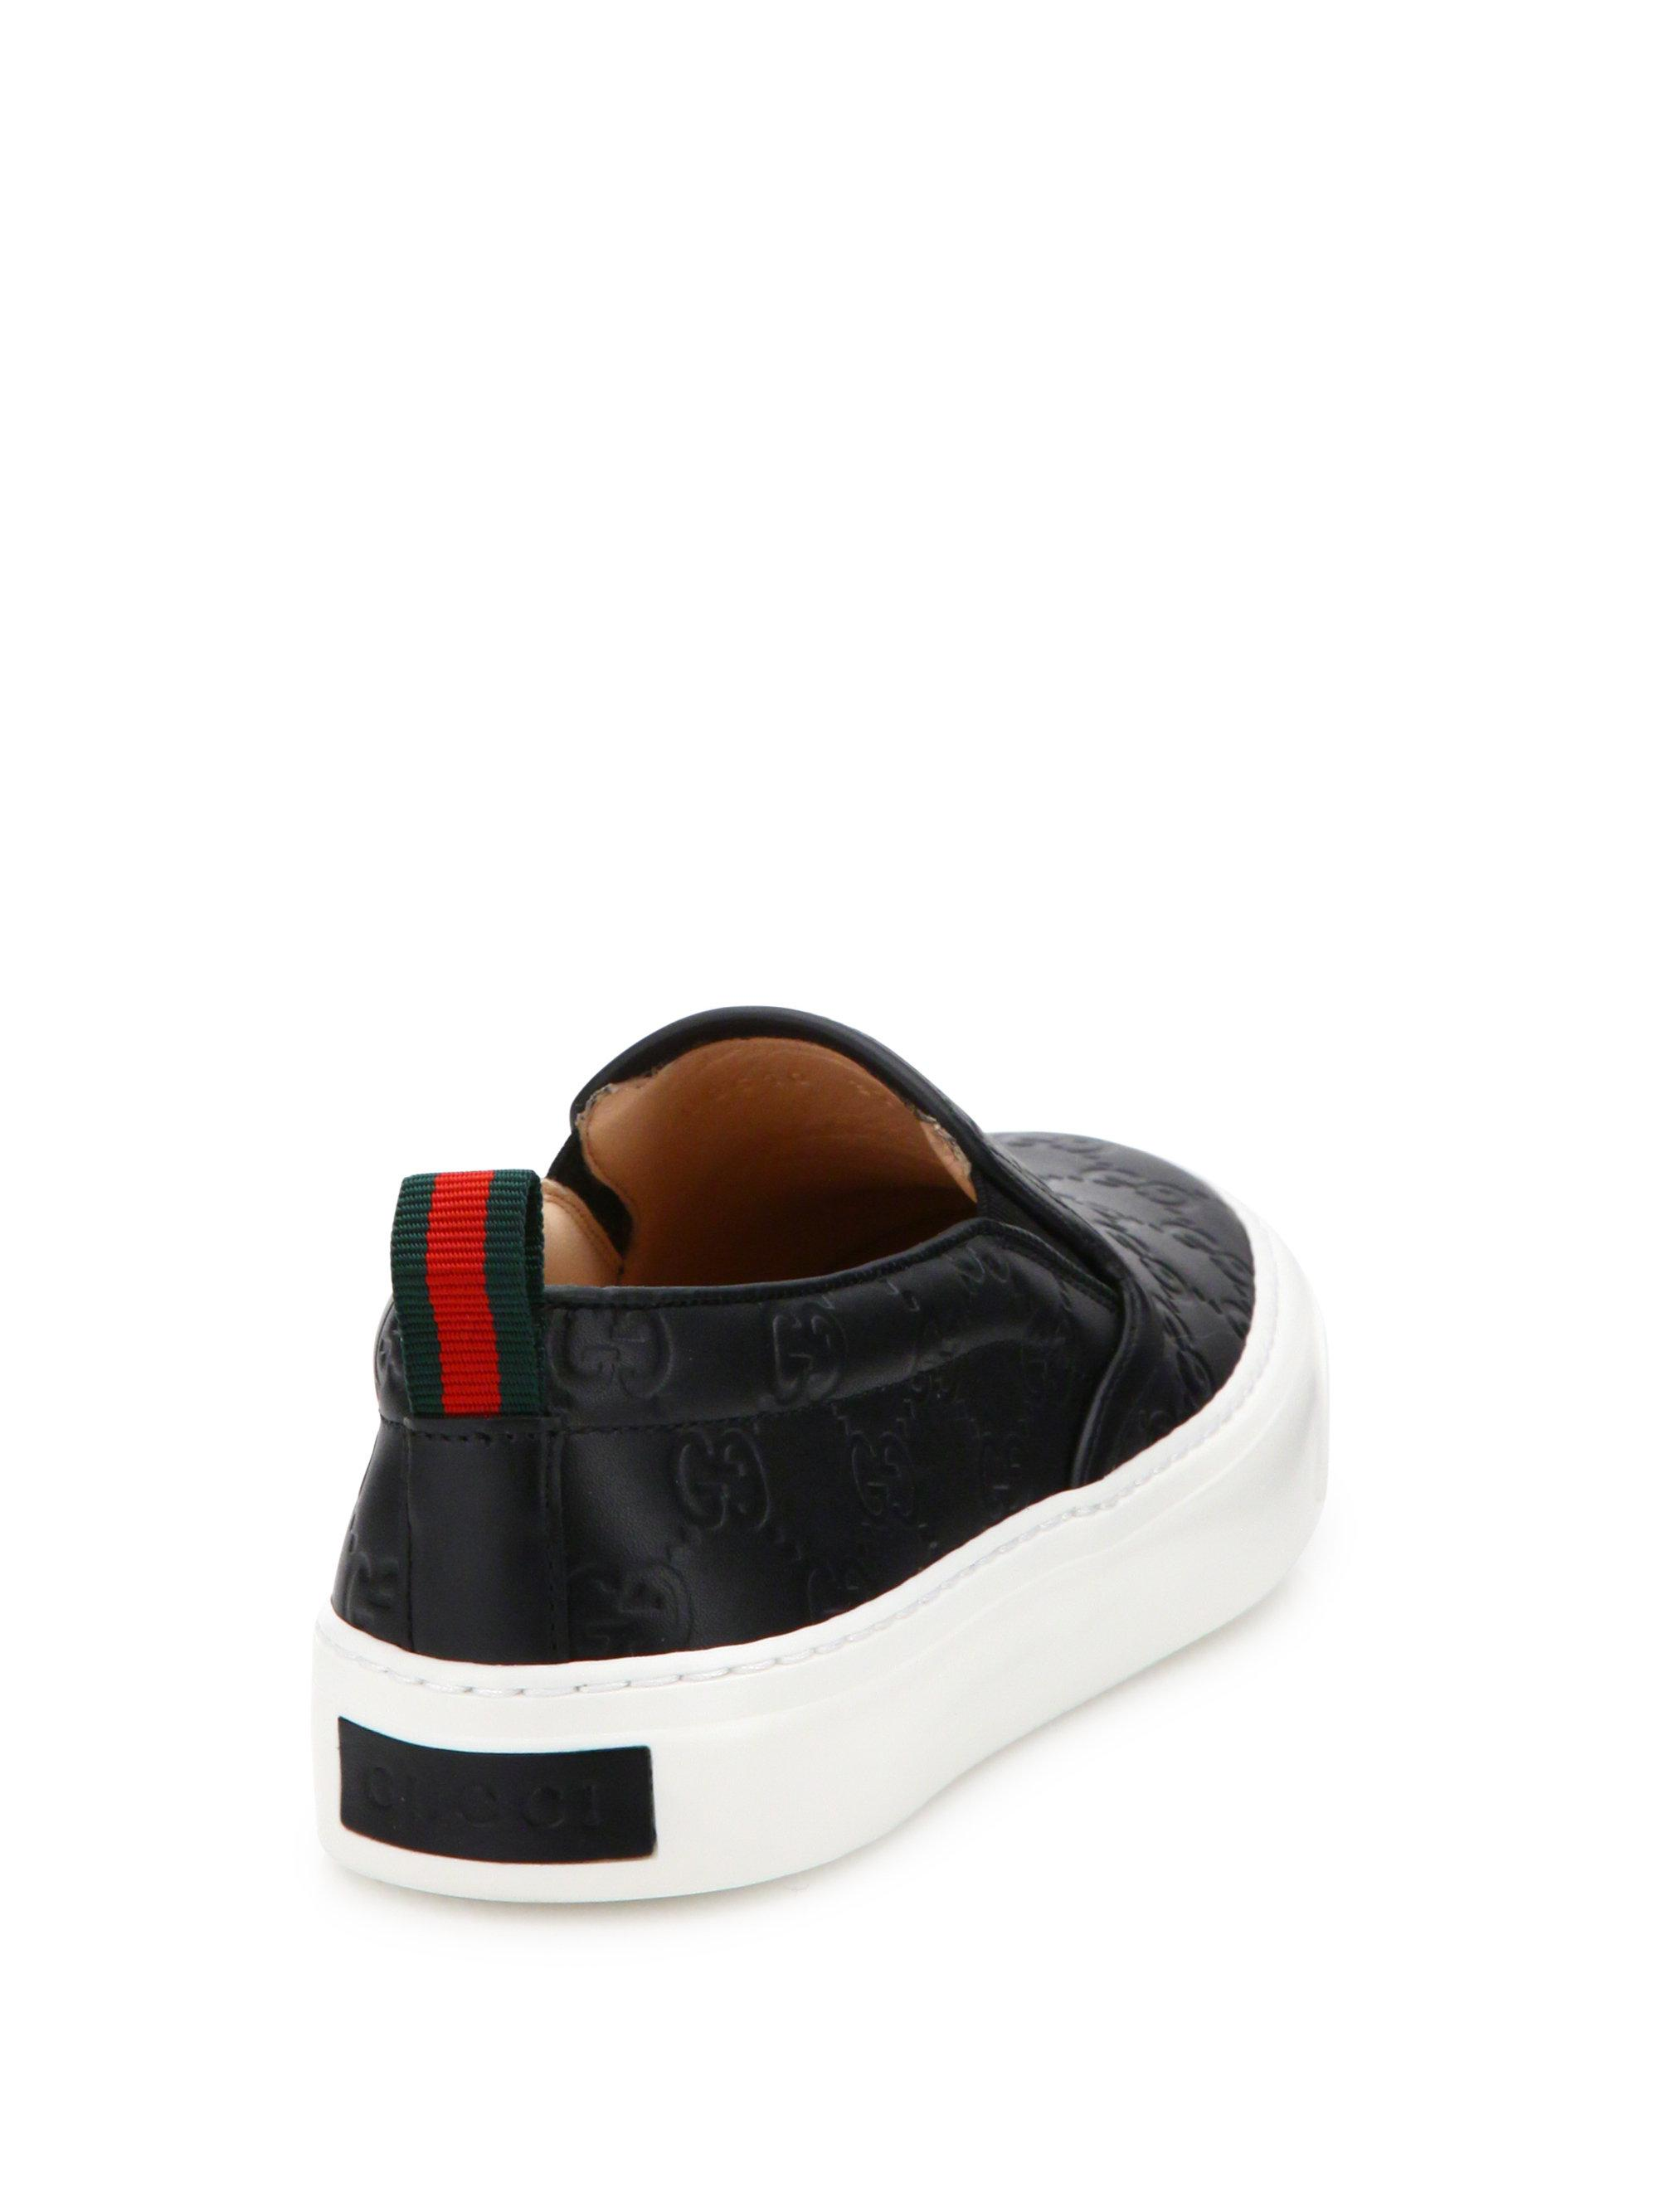 Gucci Board GG Leather Skate Sneakers NiUL0HMo